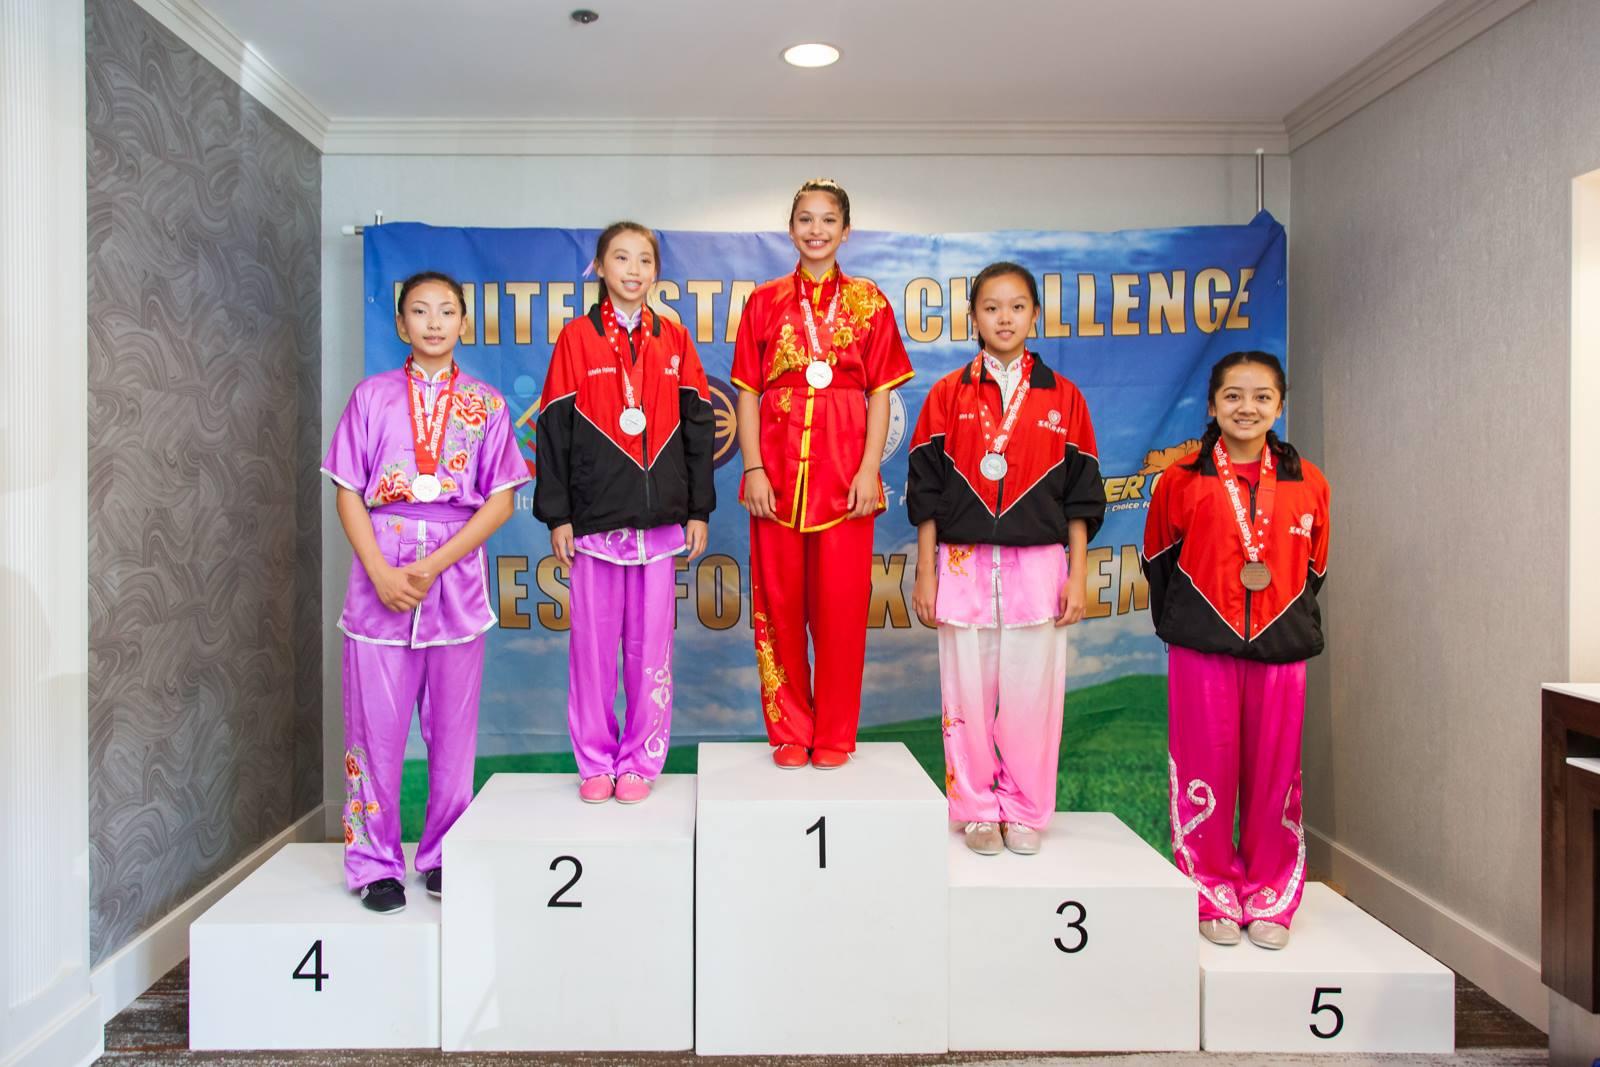 wayland-li-wushu-us-challenge-competition-maryland-2017-39.jpg